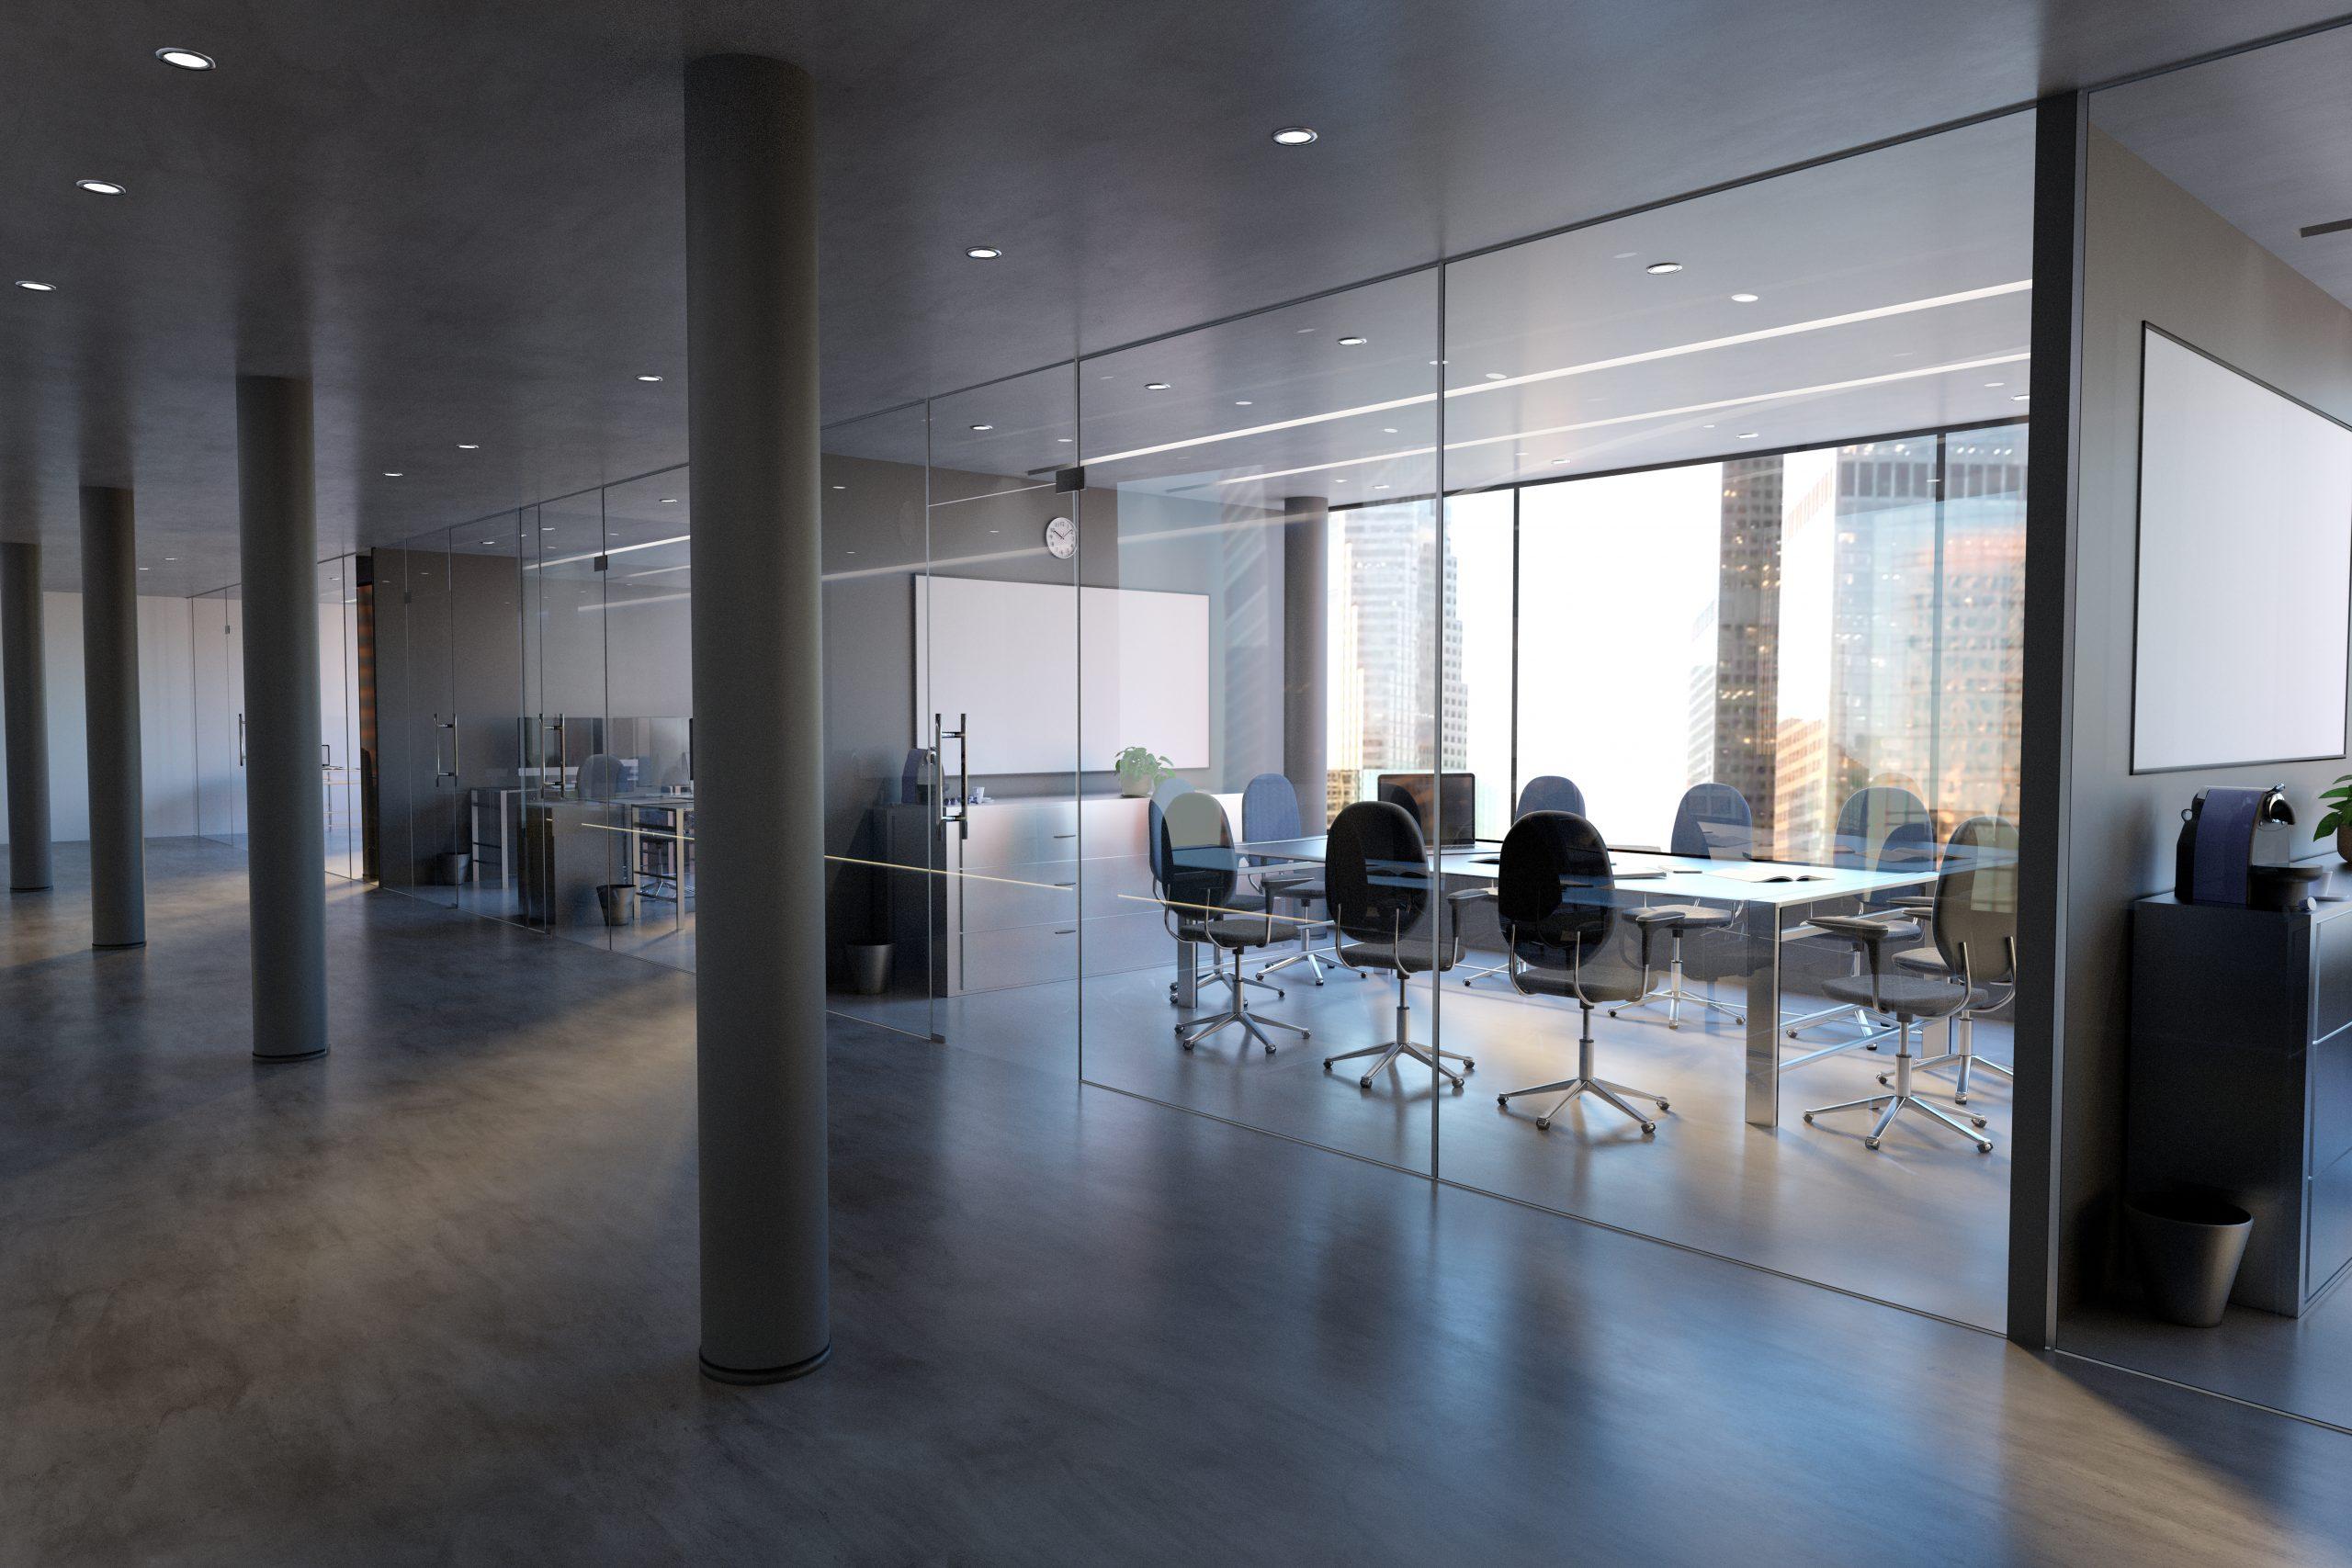 poe lighting in new construction